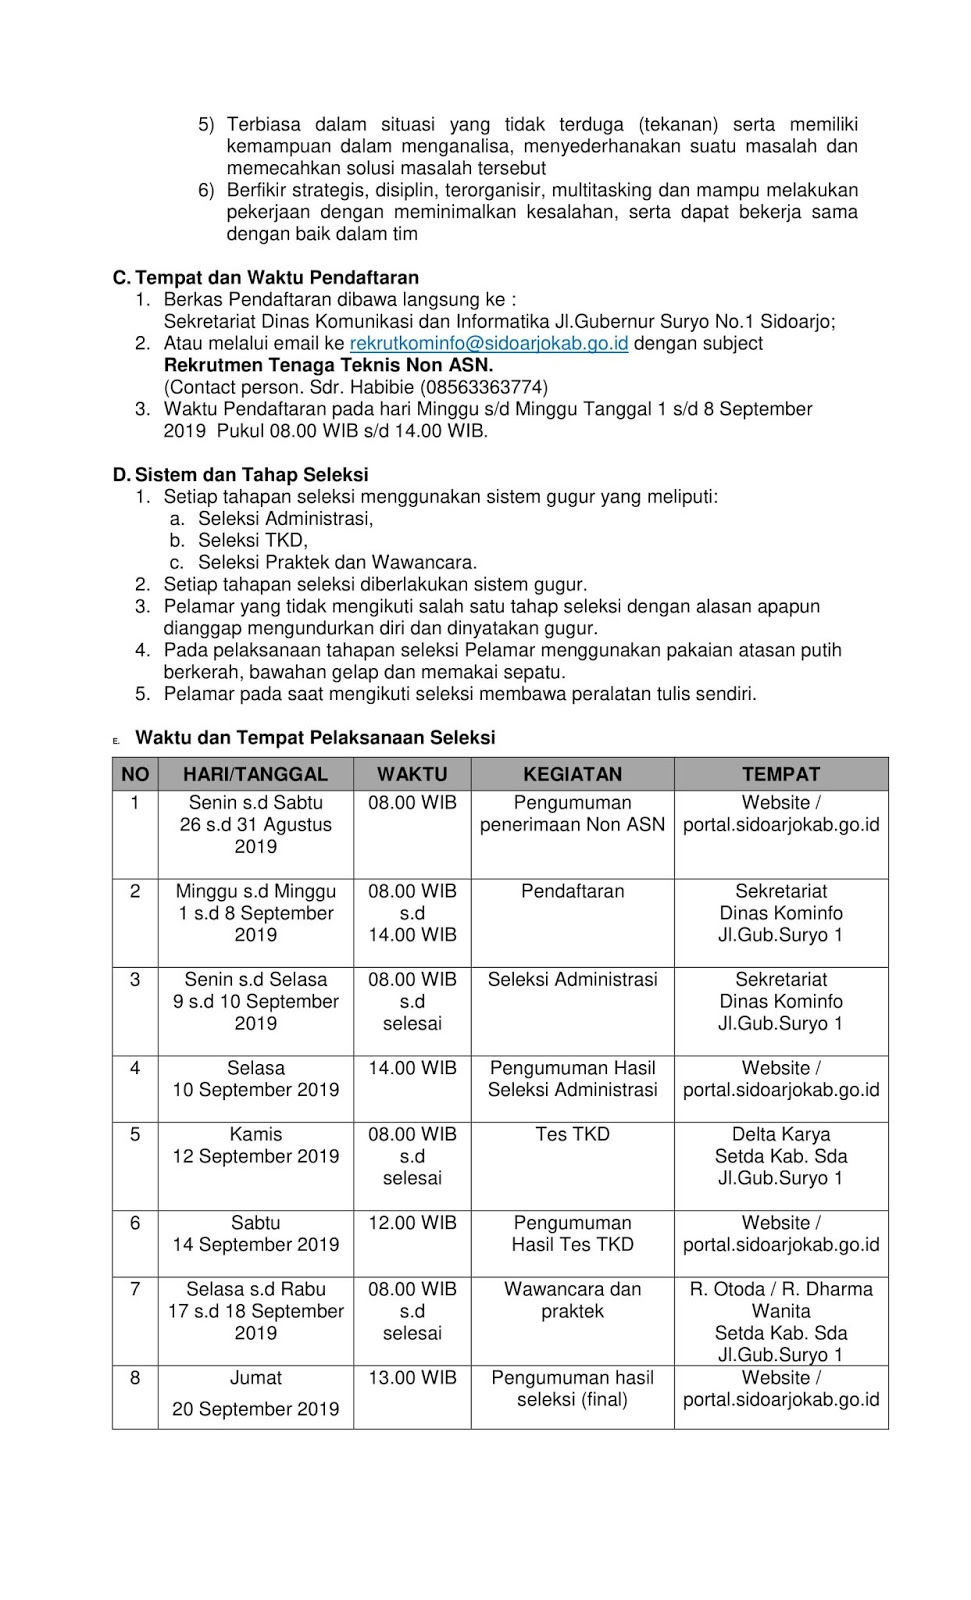 Lowongan Kerja Non ASN Dinas Komunikasi dan Informatika Kabupaten Sidoarjo